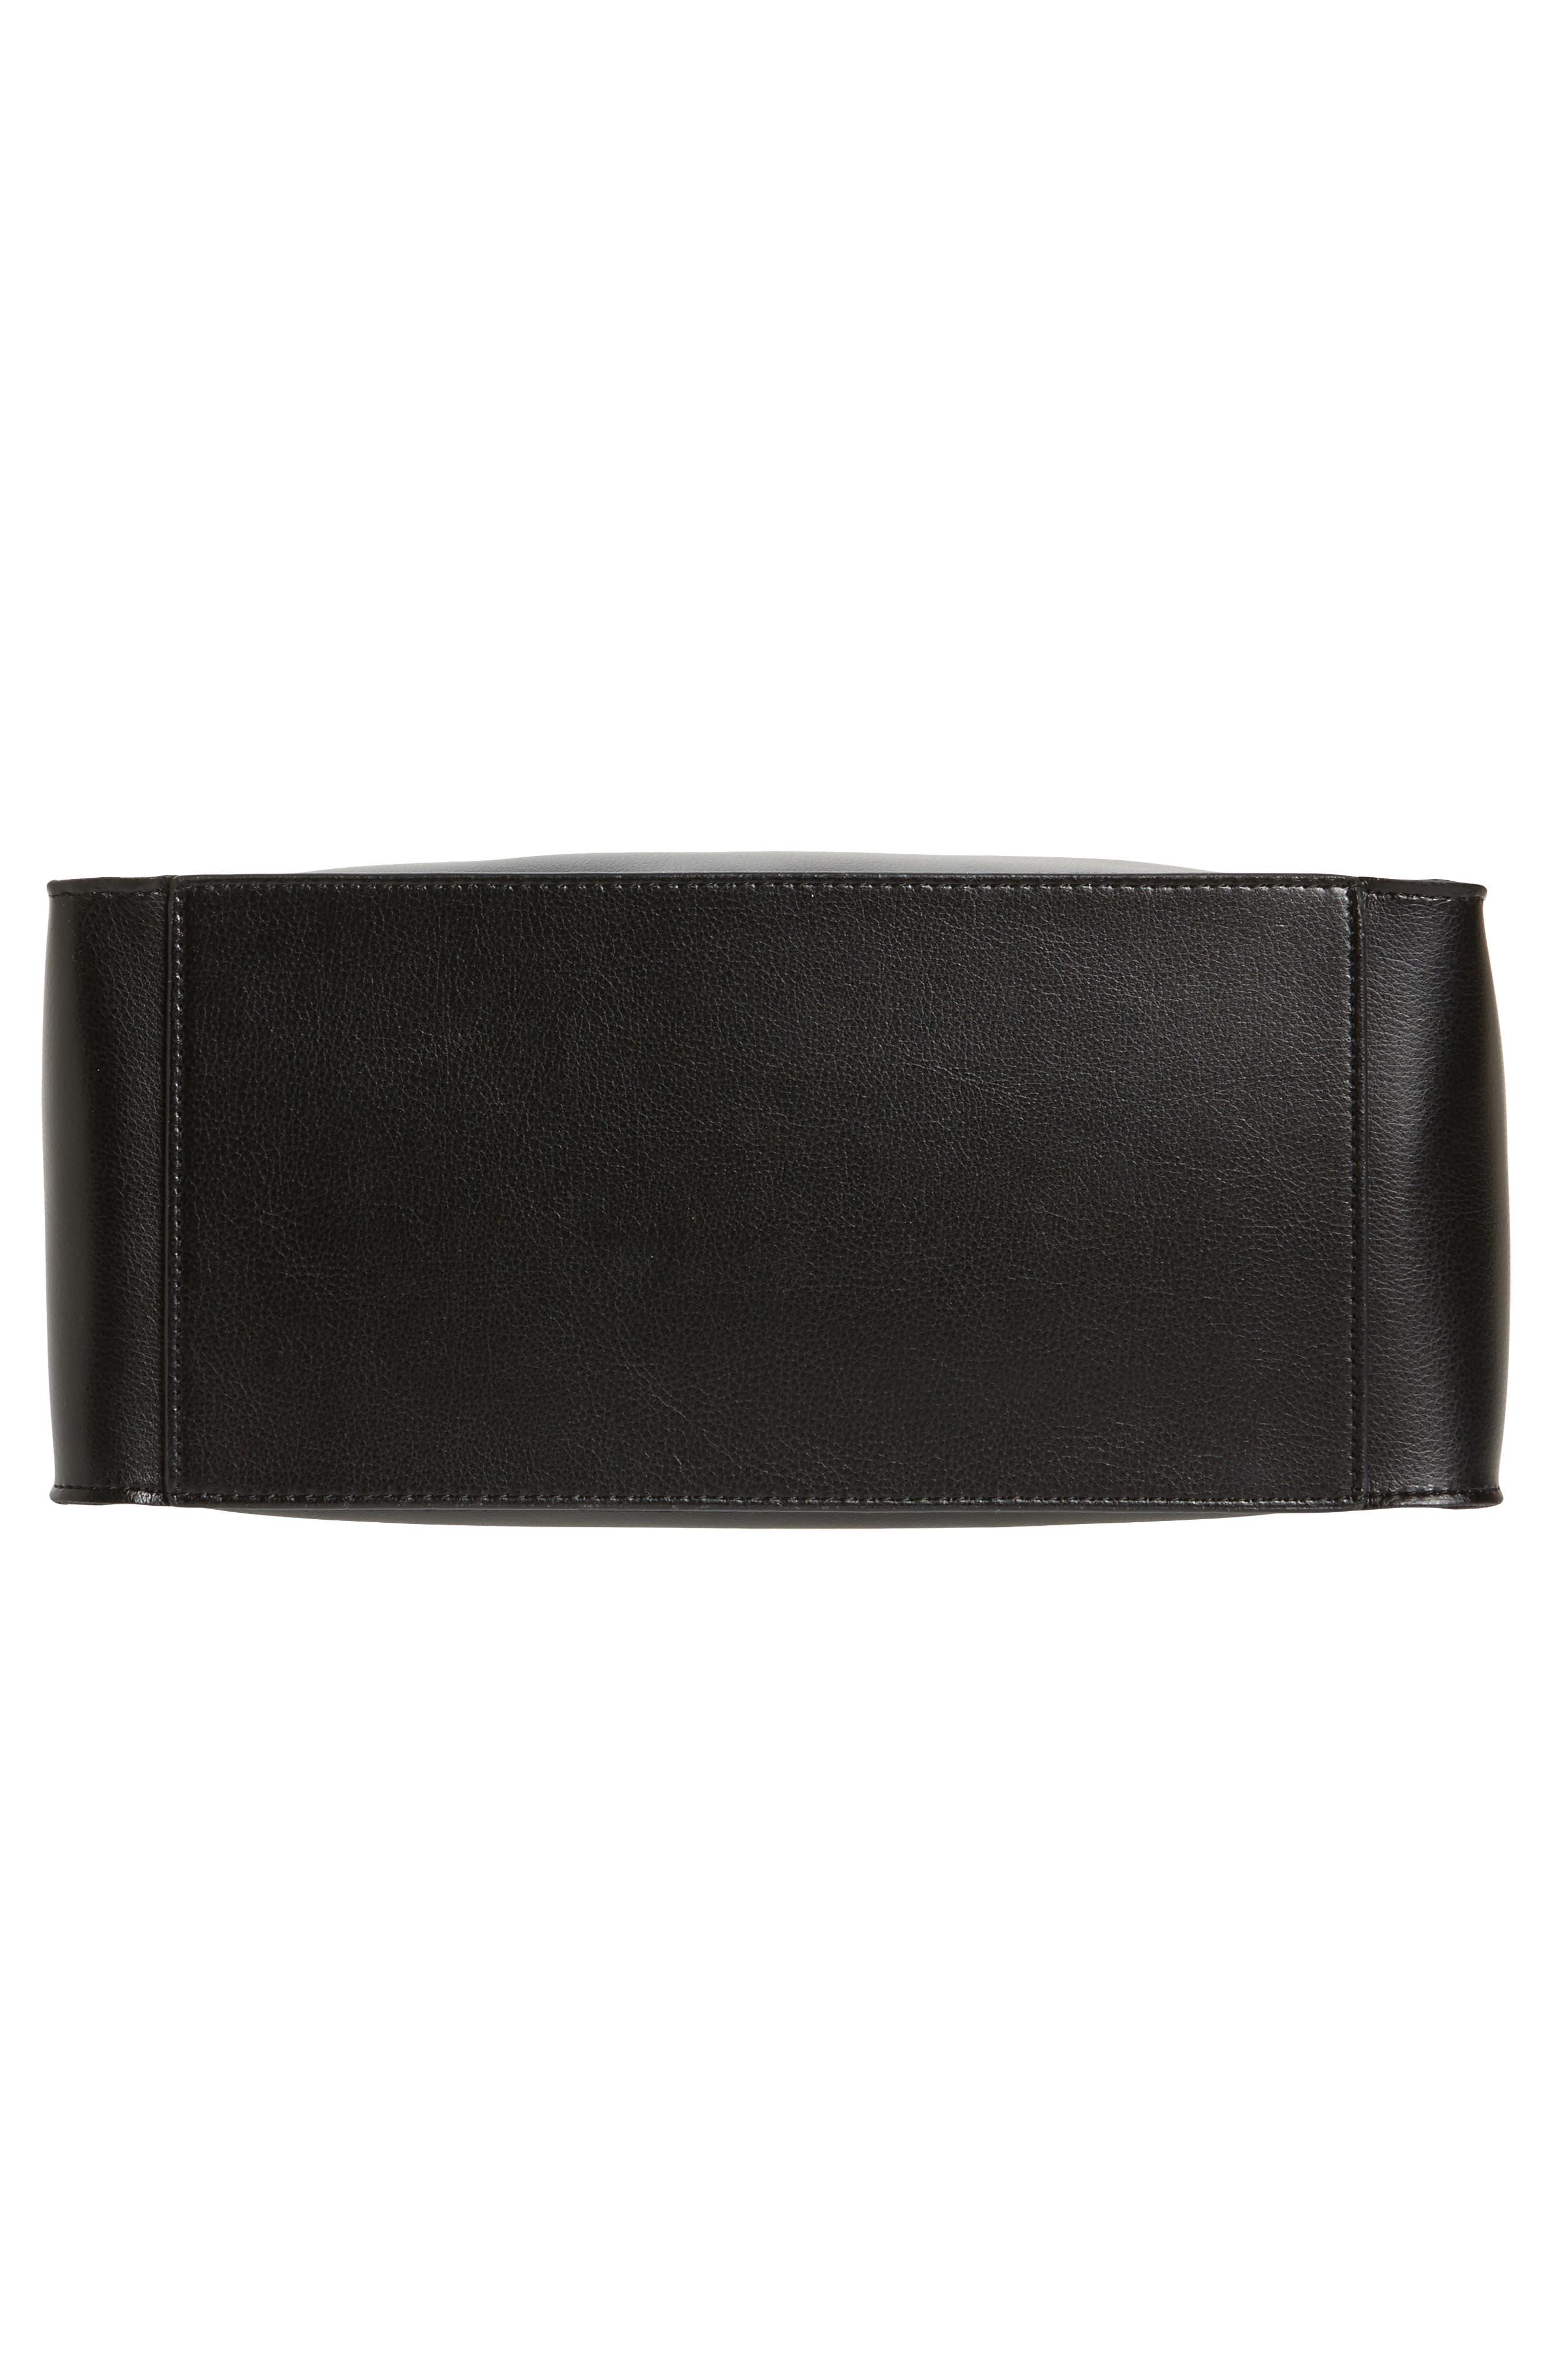 Karlie Faux Leather Bucket Bag,                             Alternate thumbnail 6, color,                             001